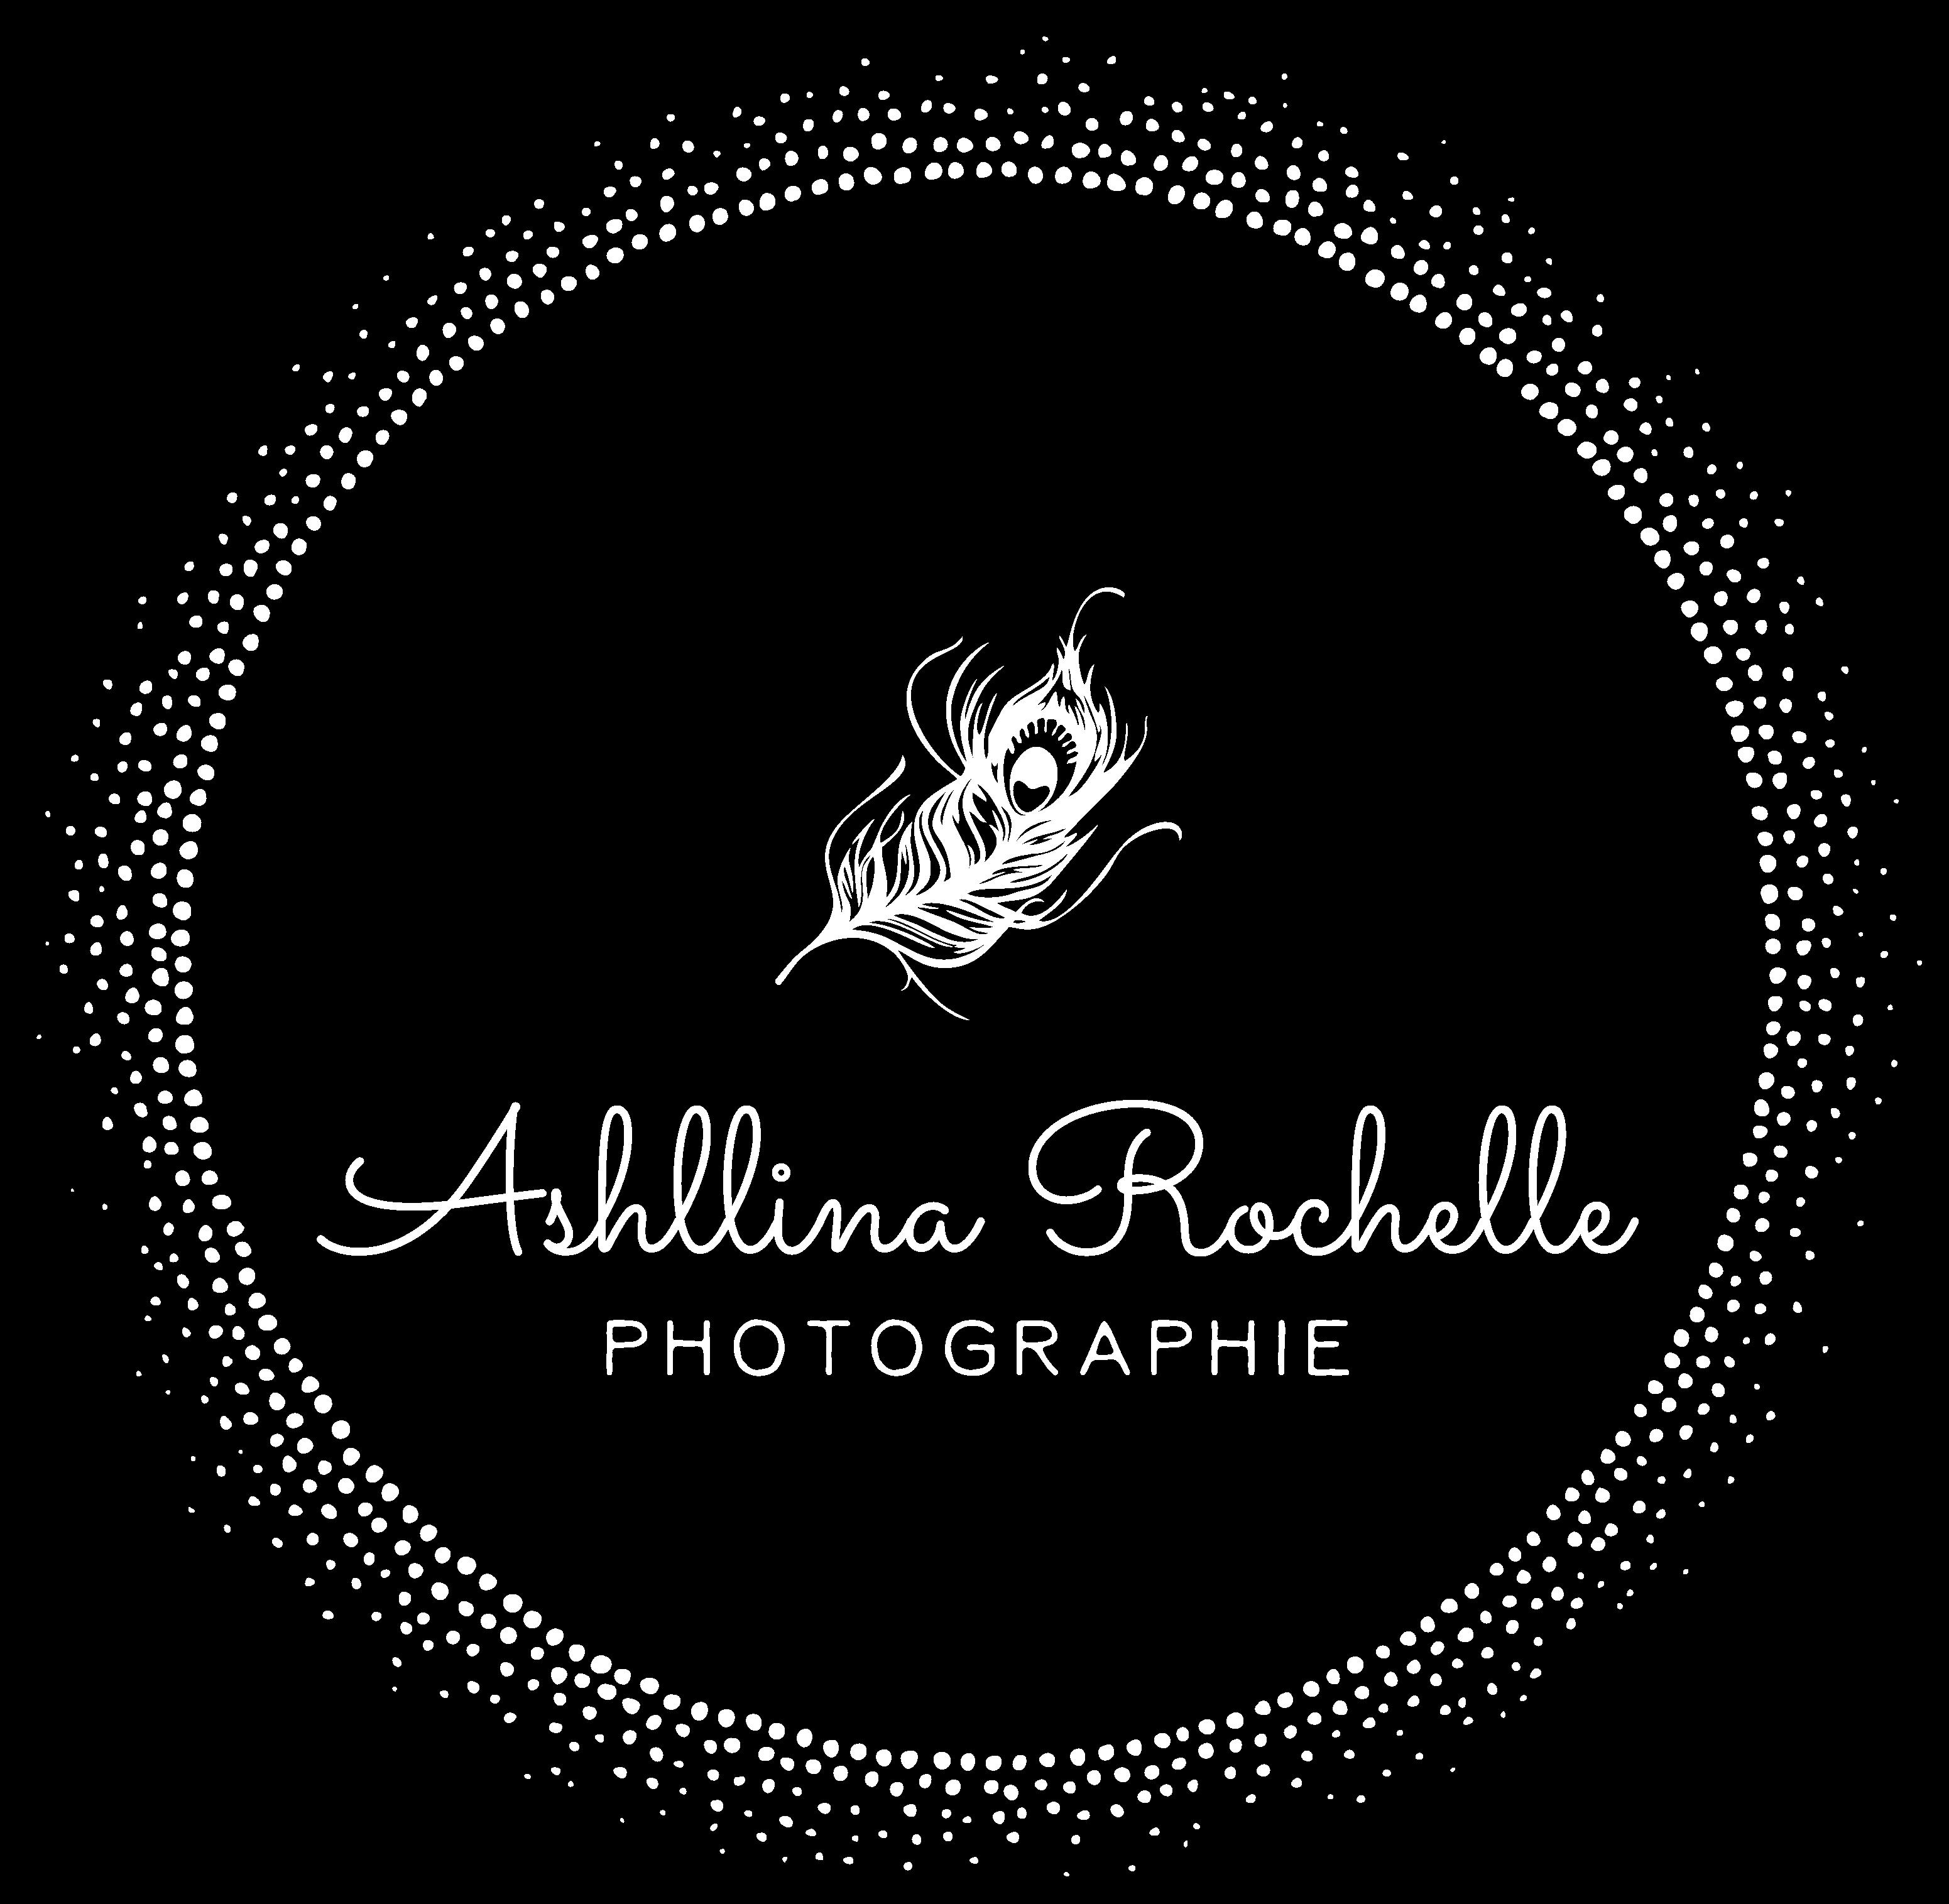 Ashllina Rochelle Photographie